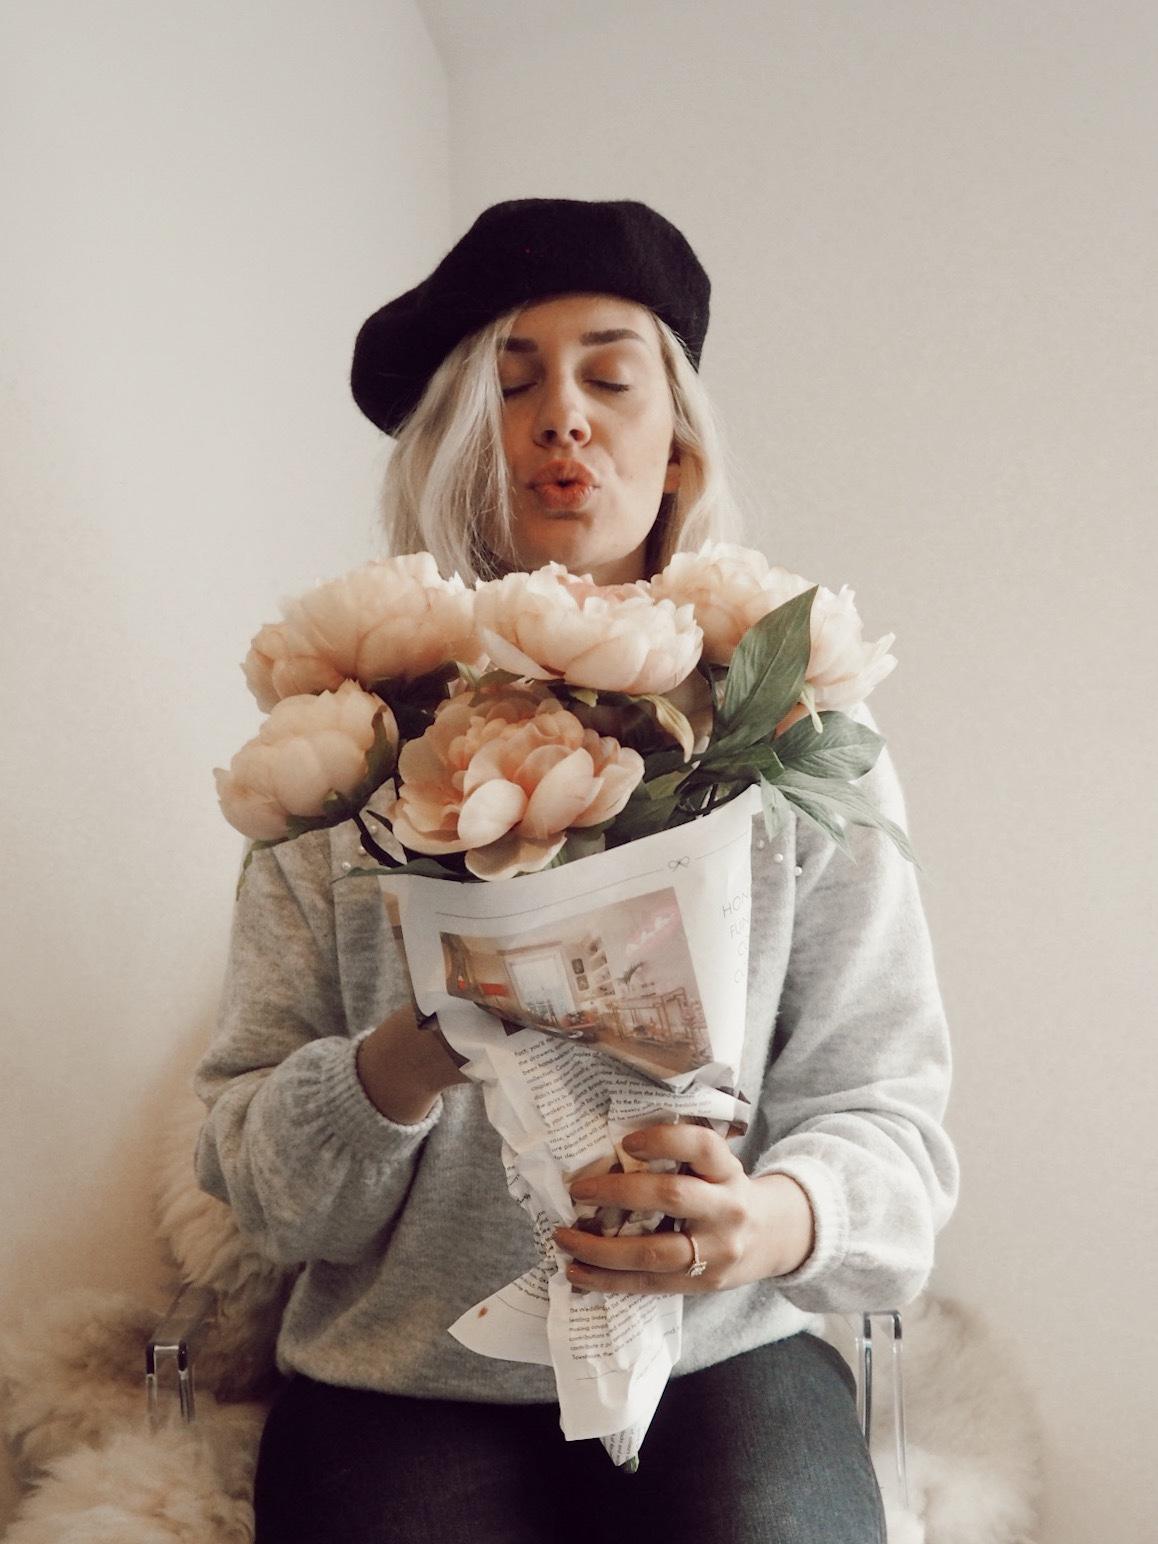 girl in beret holding flowers